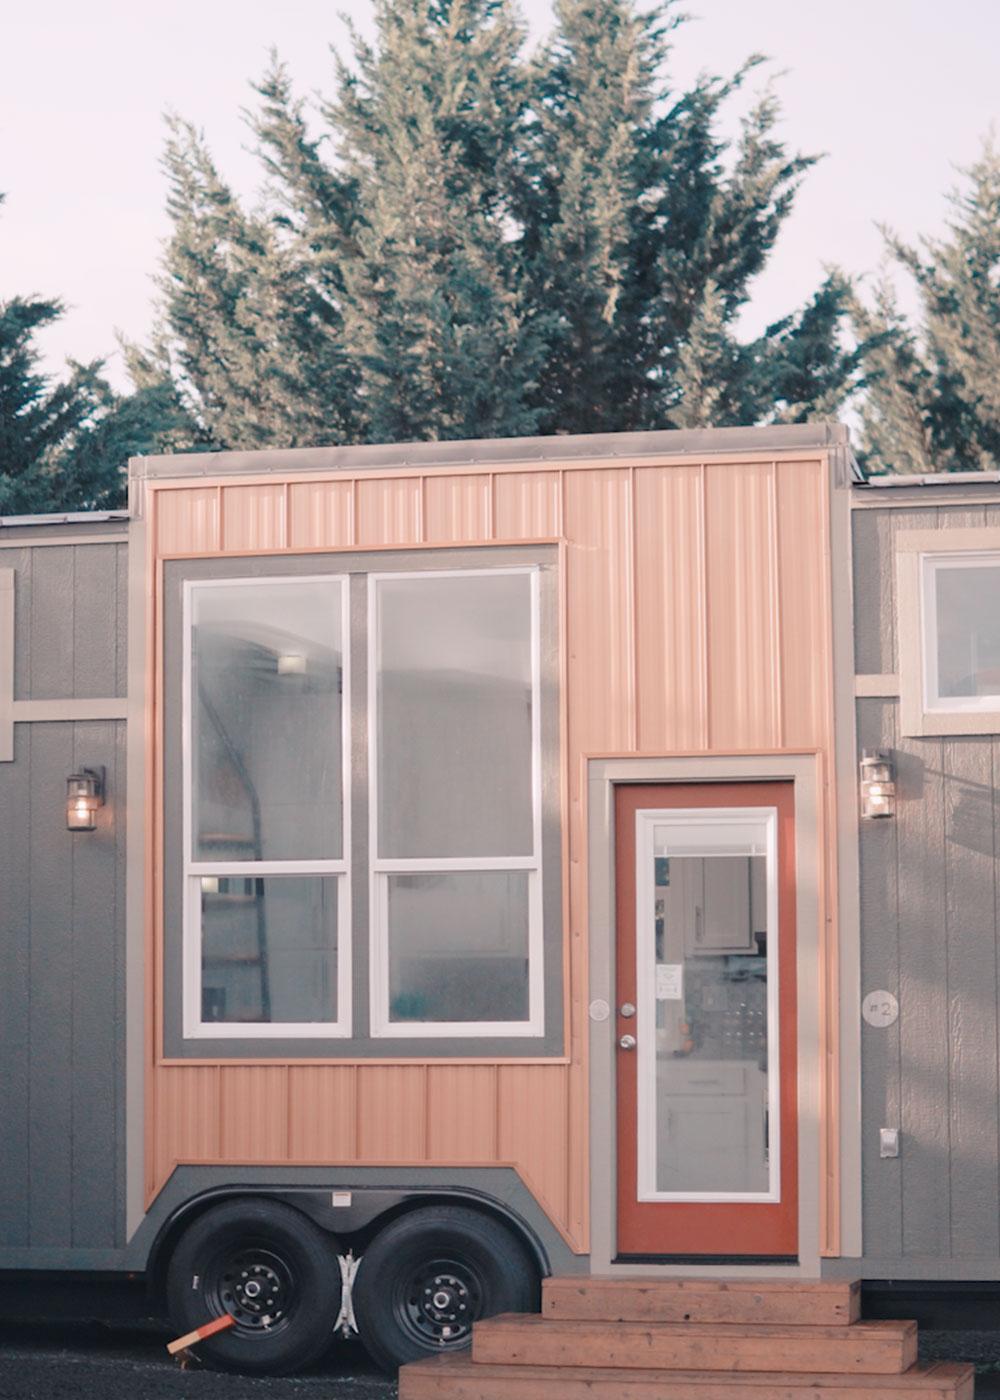 Tiny House DesignClass